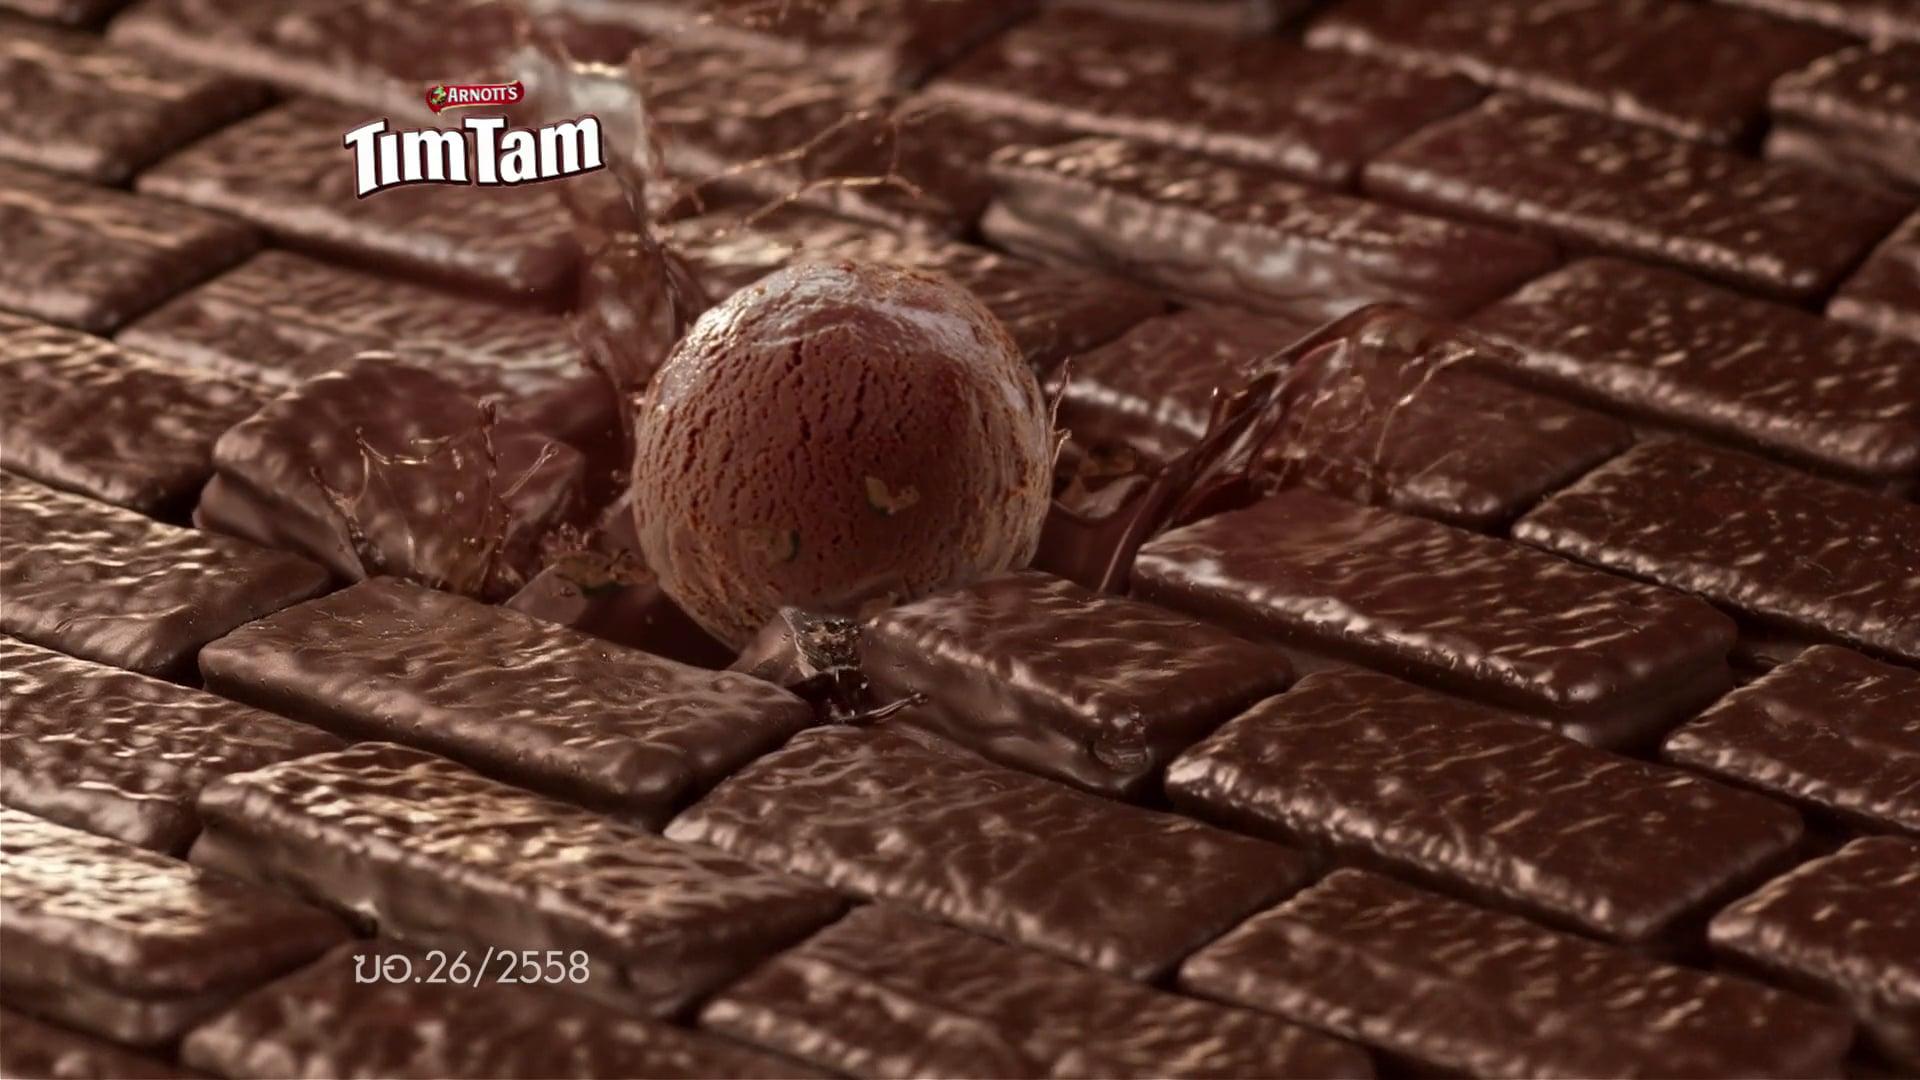 Vittorio Badini Confalonieri-WALLS - TimTam ChocoBlast (PRODUCT DEMO ONLY)